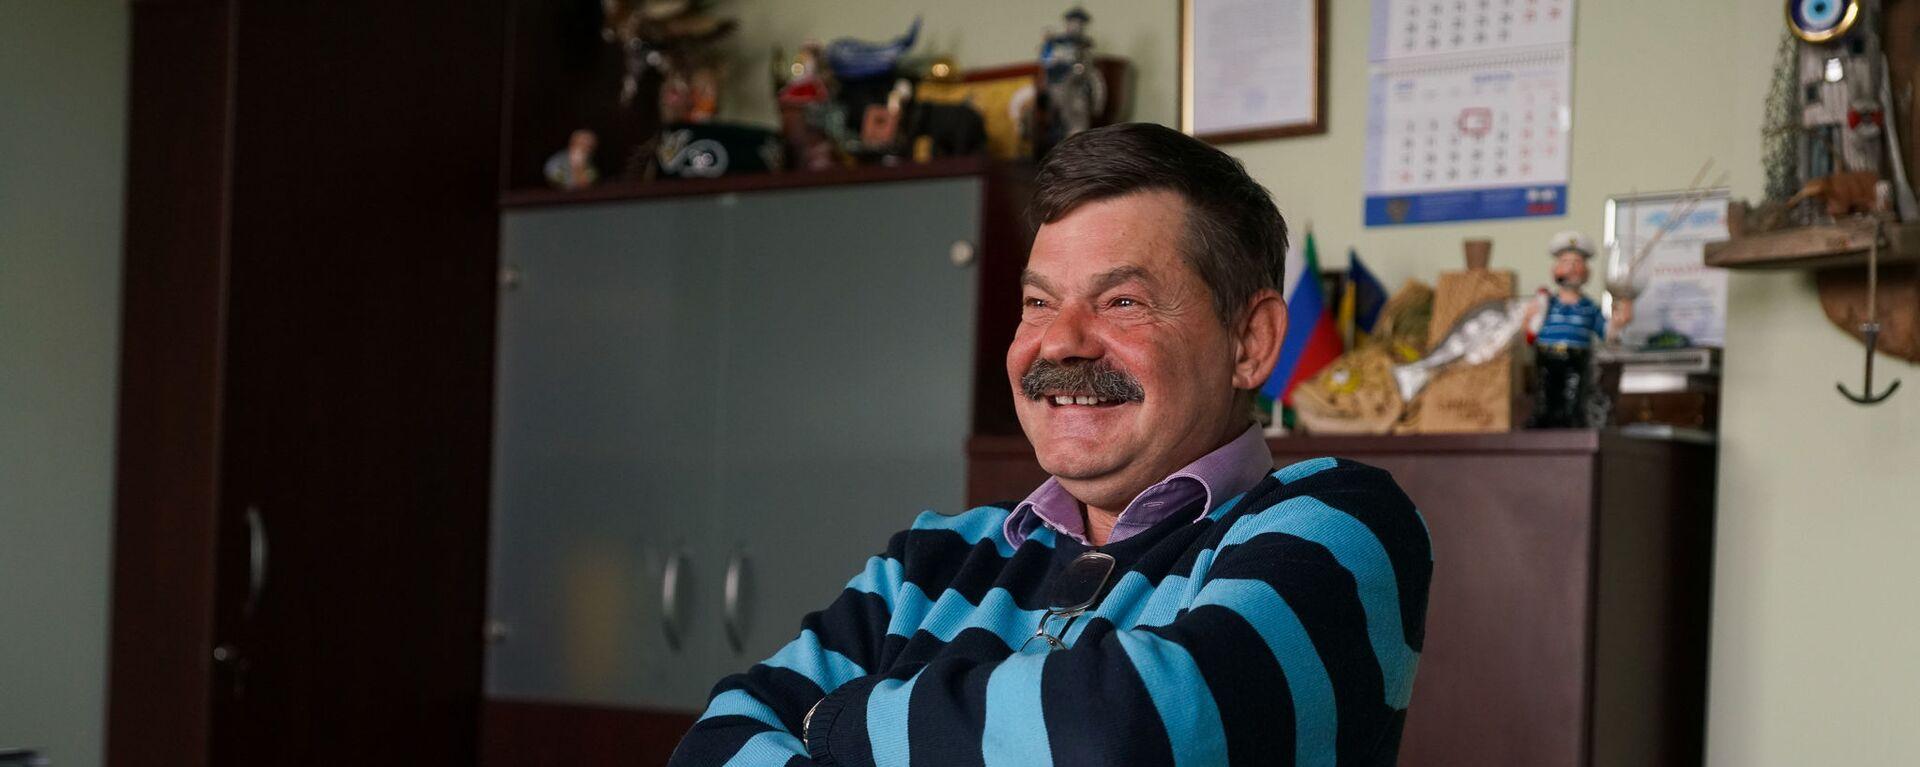 Глава компании Kolumbija Ltd Игорь Крупник - Sputnik Латвия, 1920, 06.05.2021